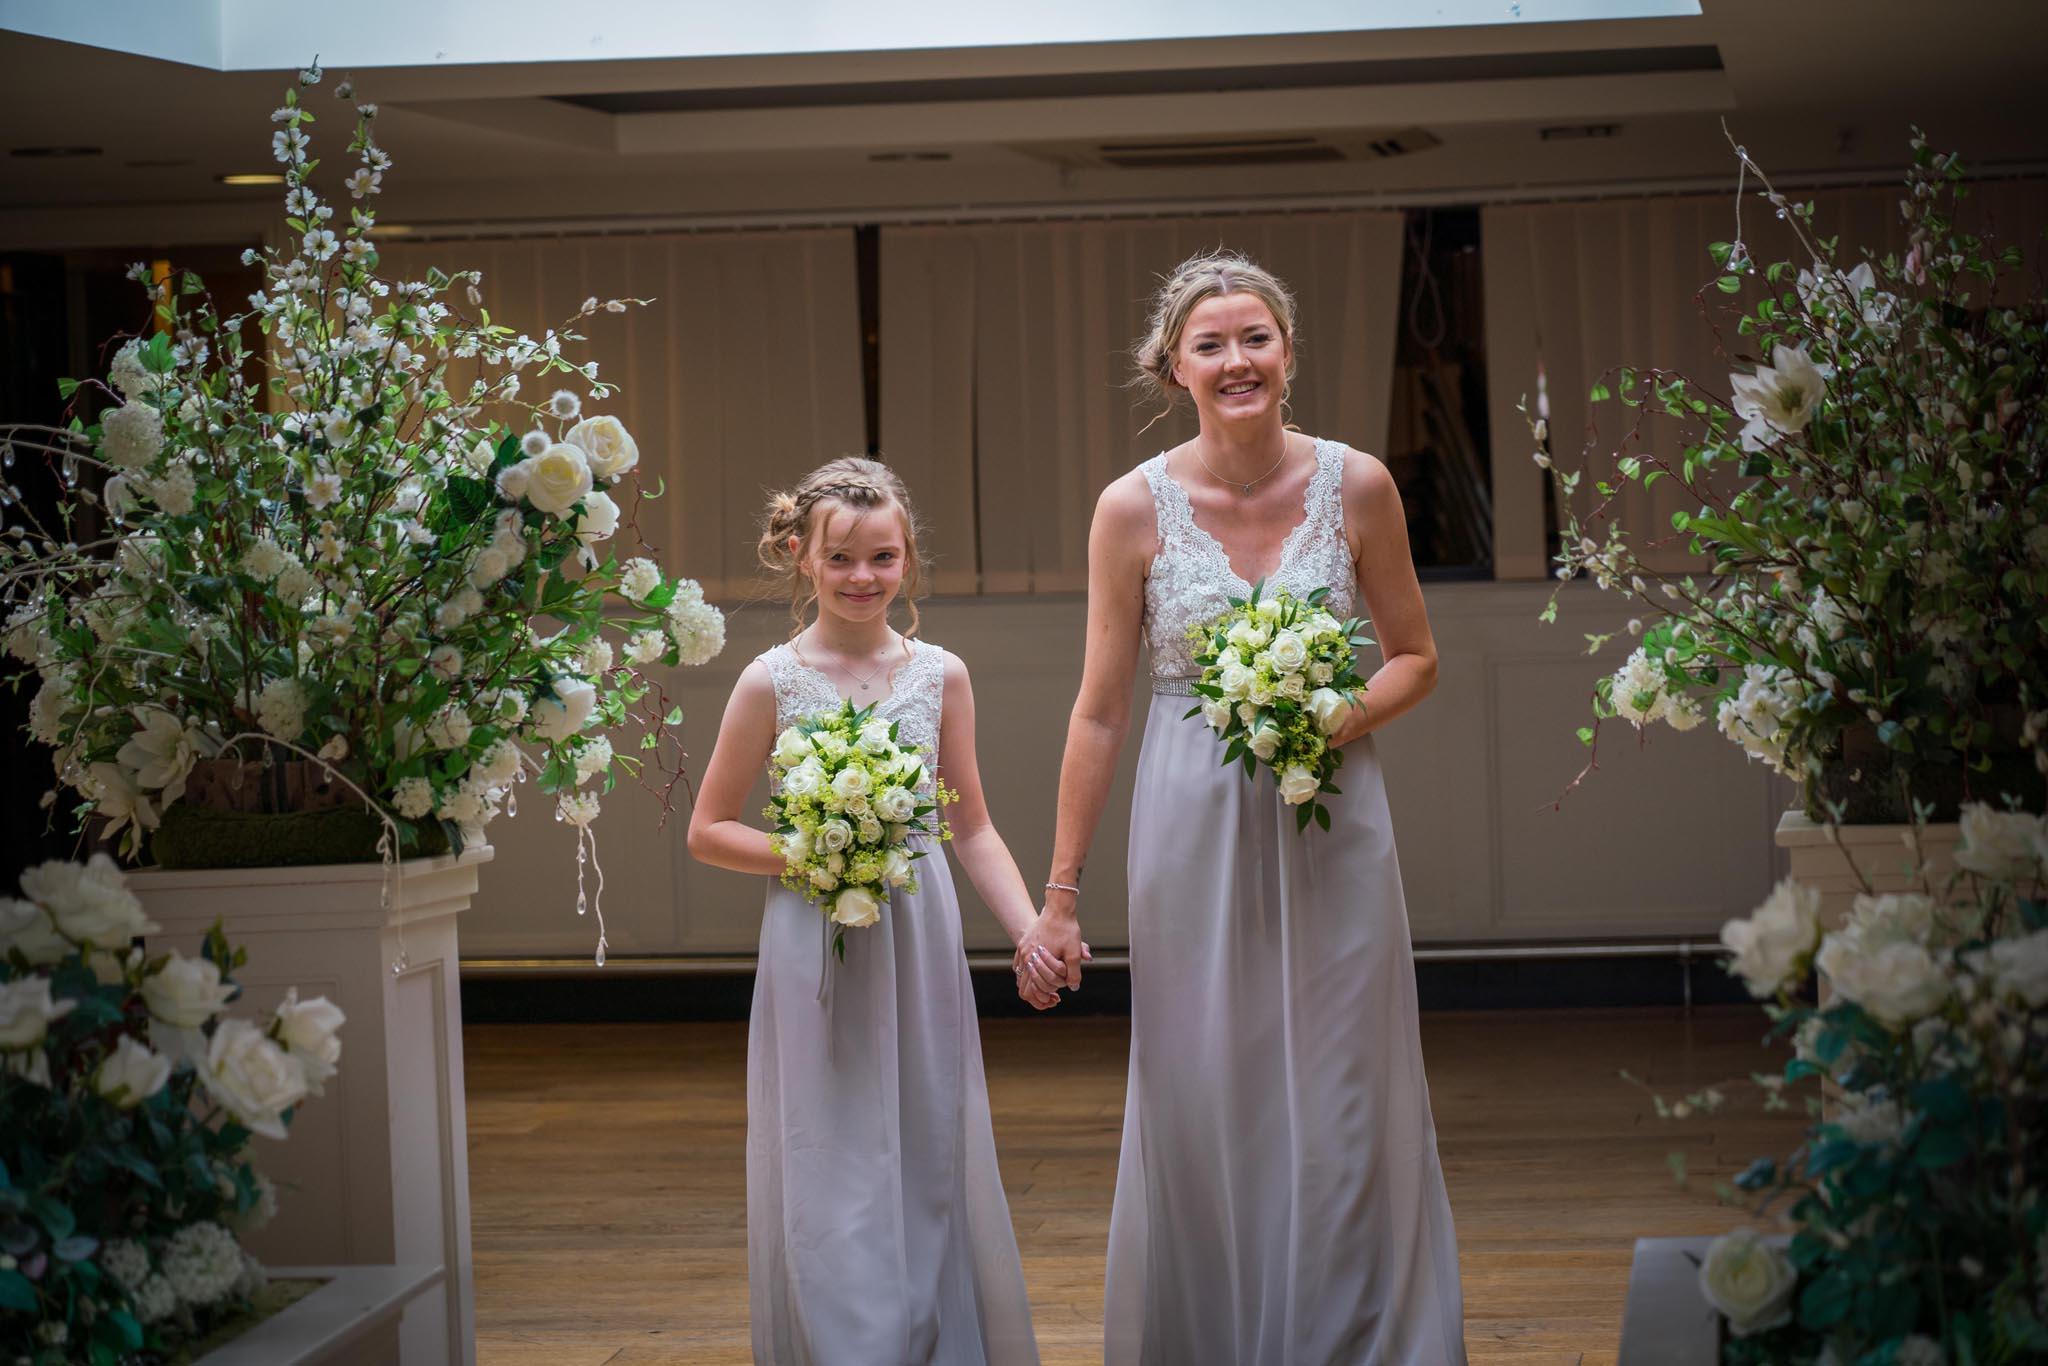 276-Ceremony-Luke-Yasmin-The-Rayleigh-Club-Wedding-Photography.jpg